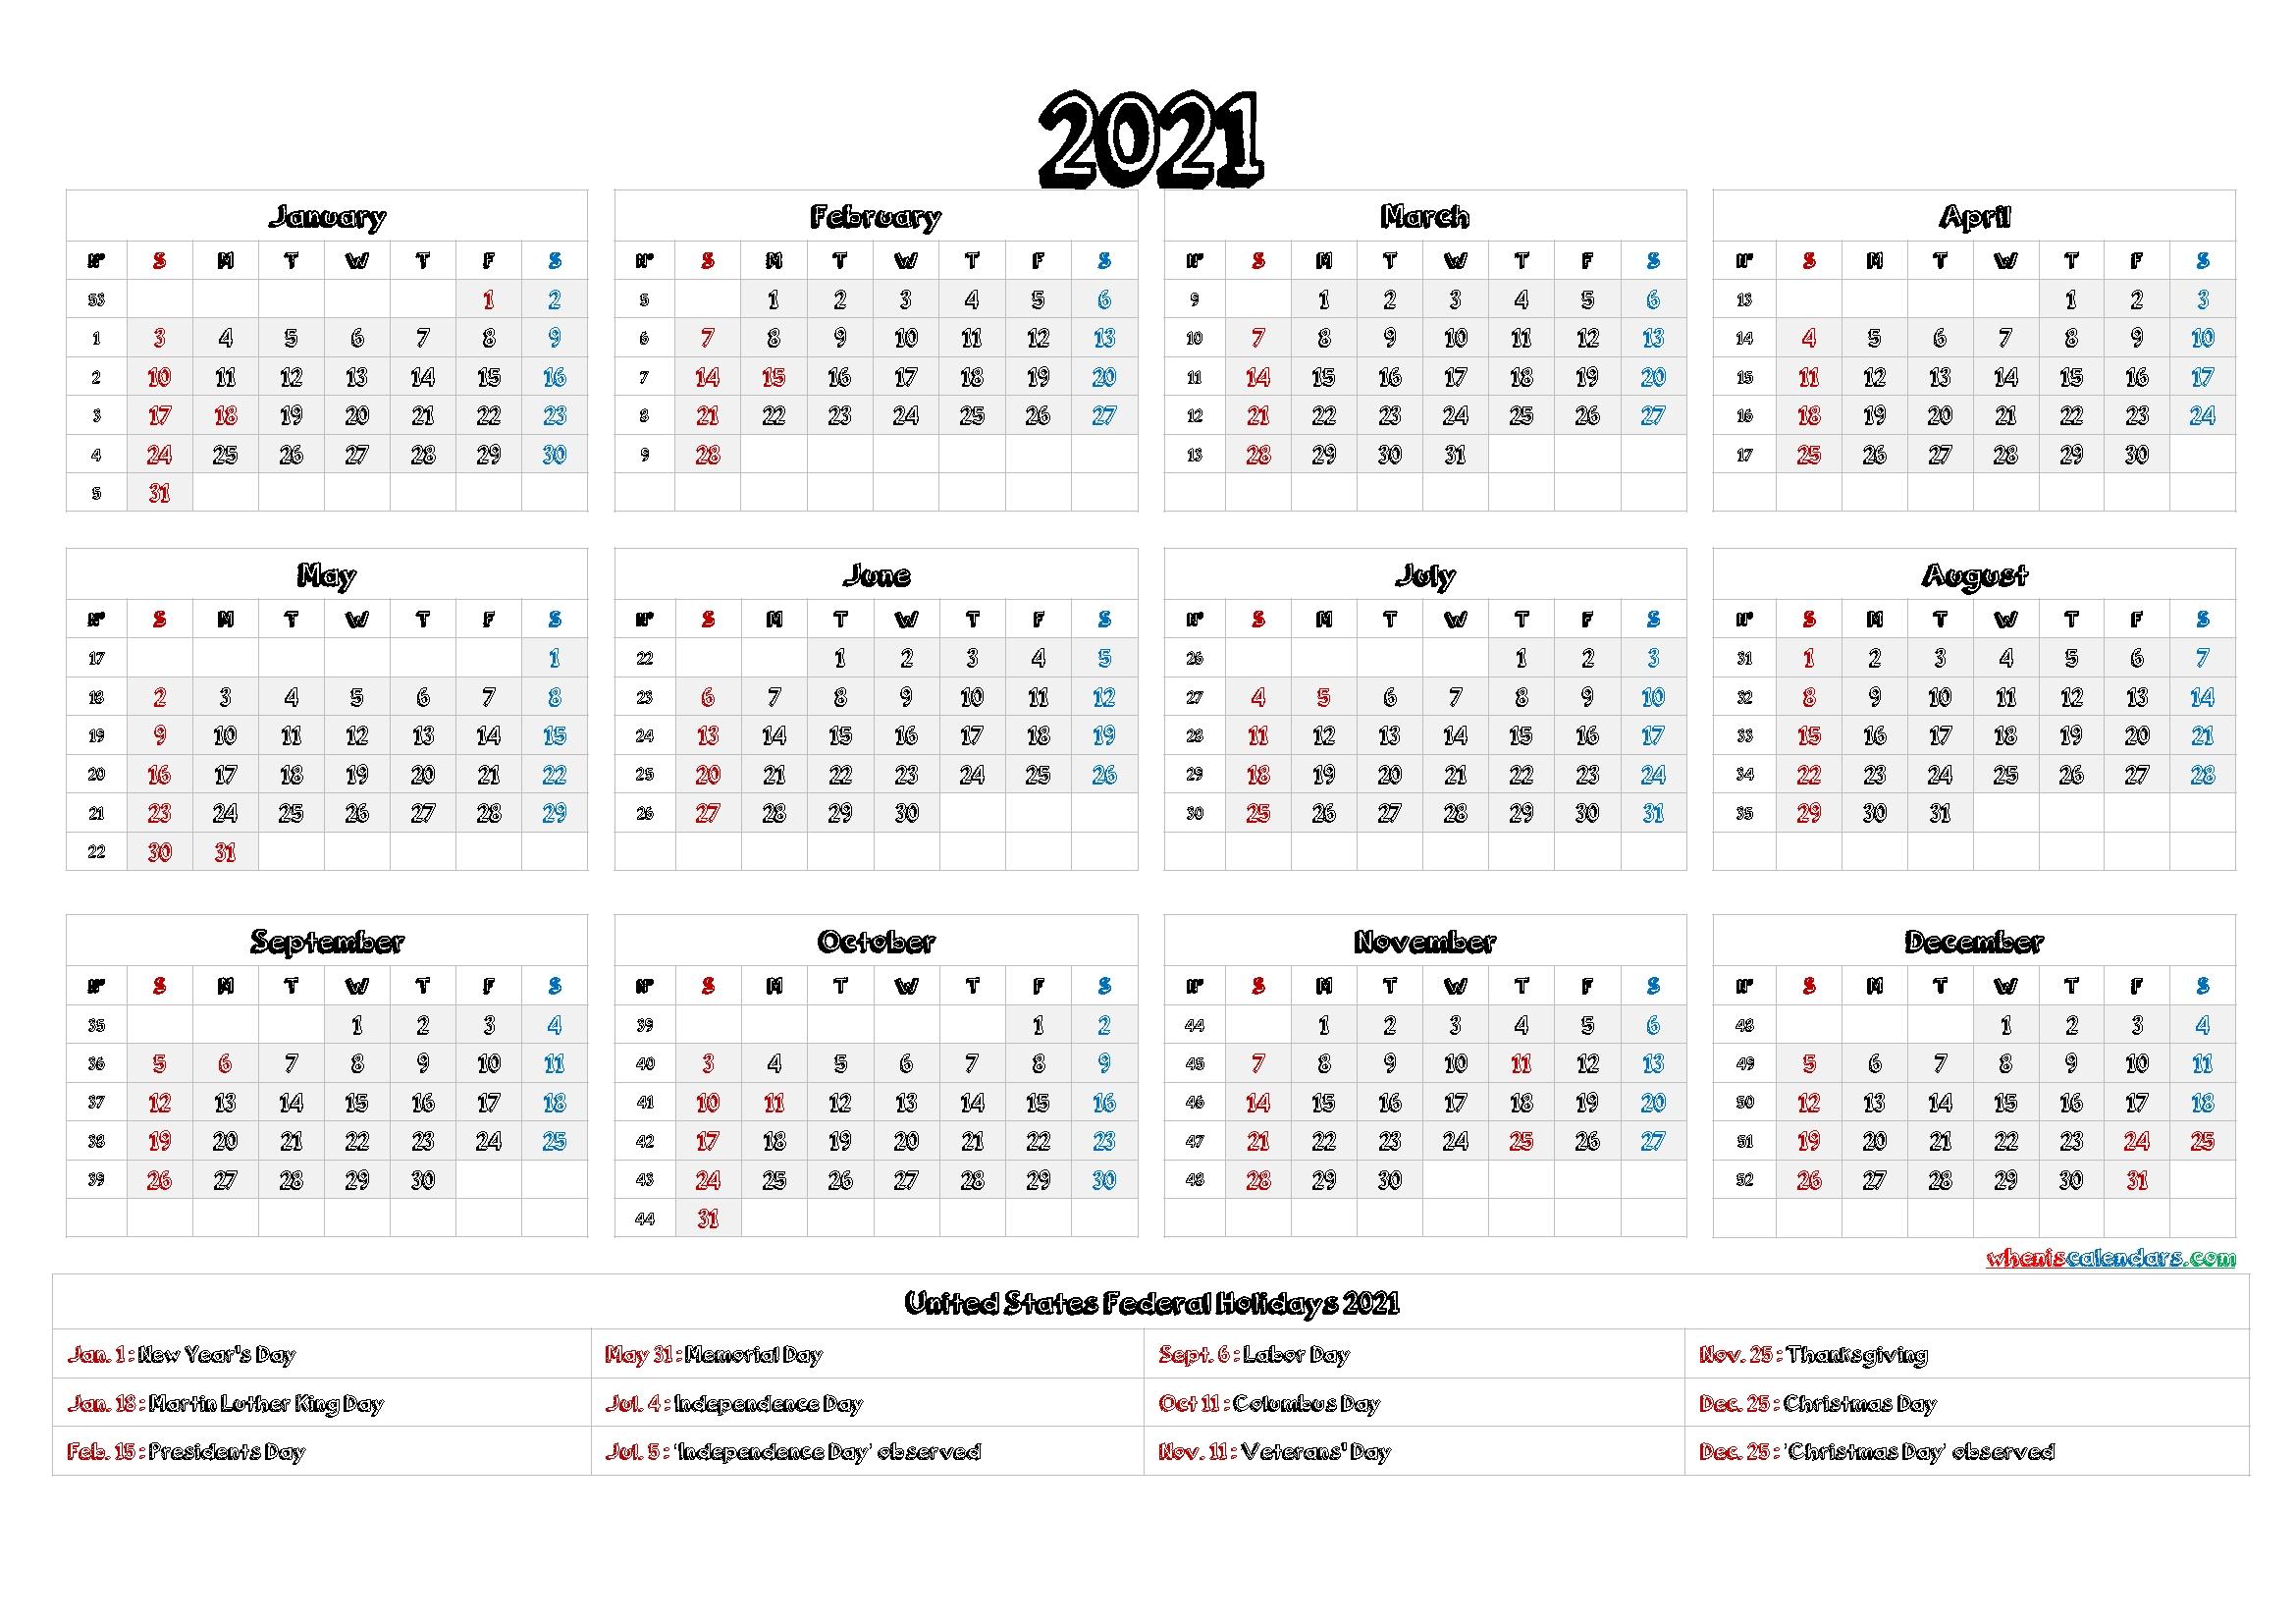 Free 2021 Calendar Printable With Holidays - 12 Templates | Free Printable 2020 Calendar With-2021 Calendar Fill In